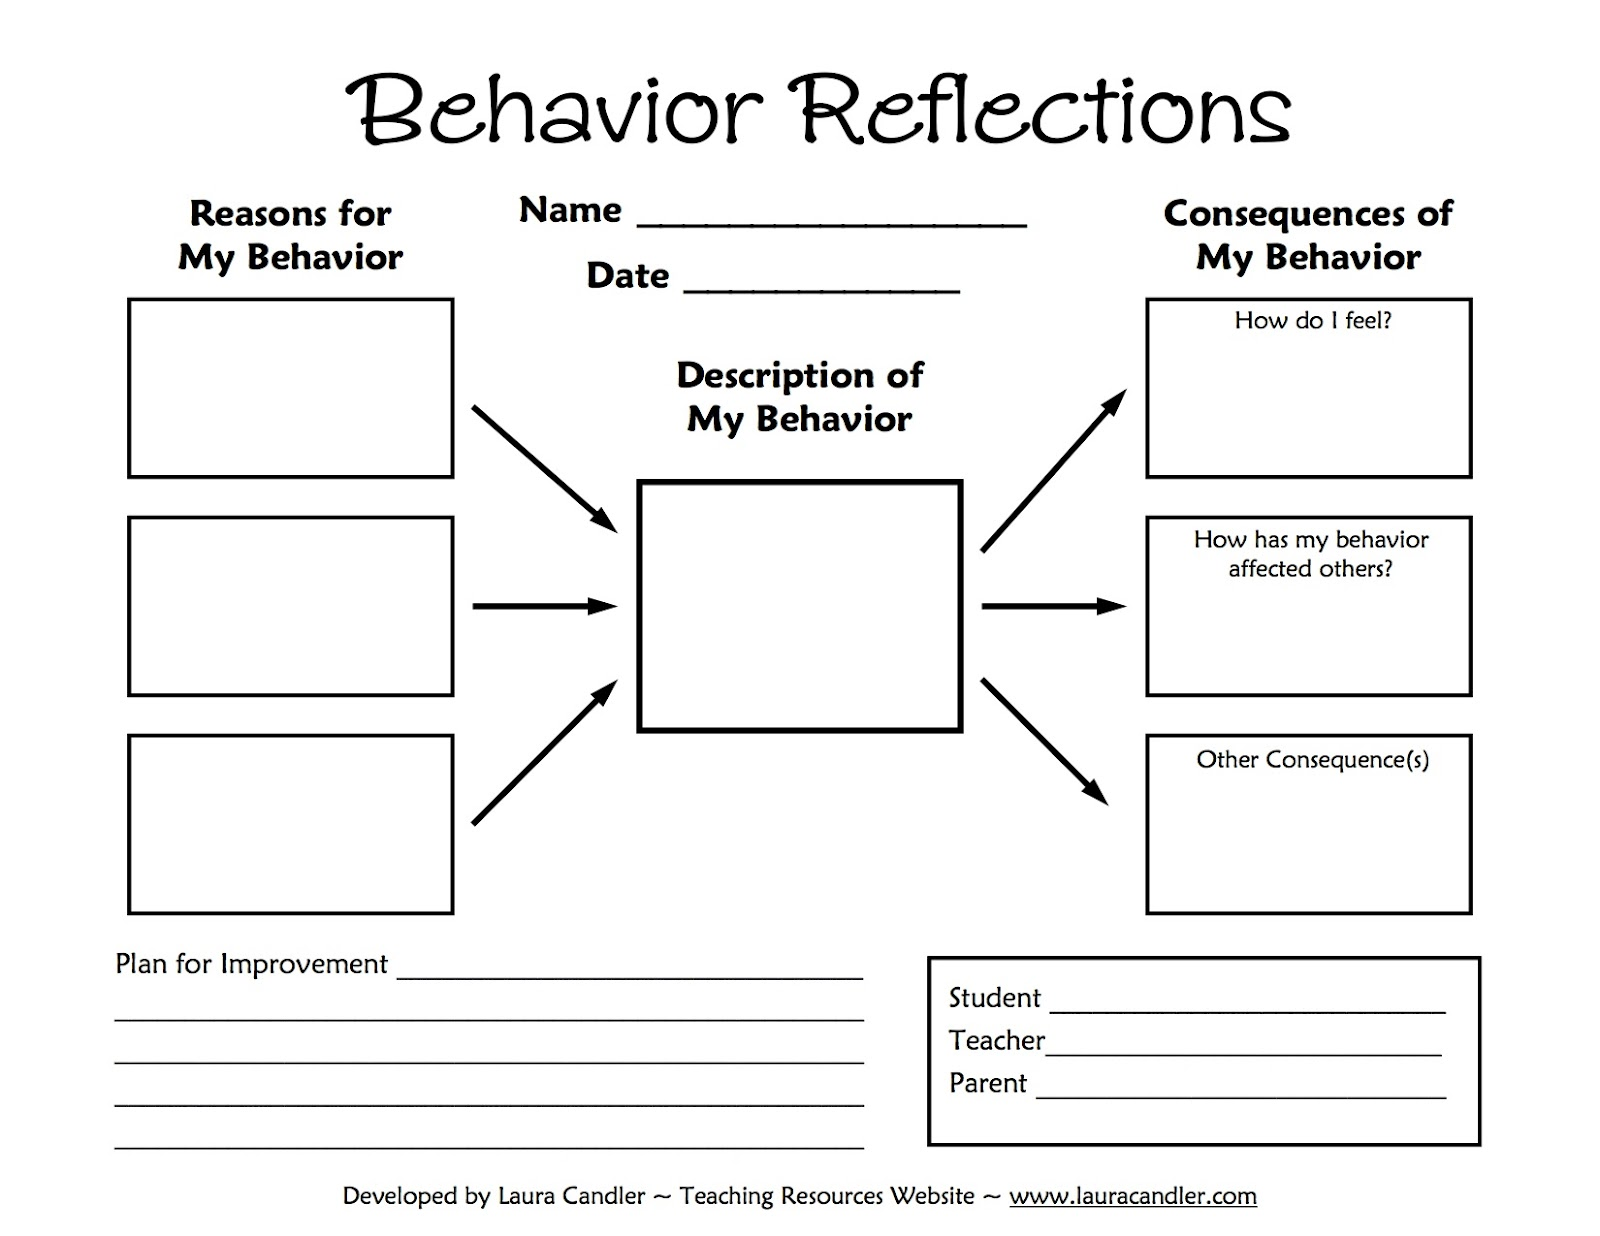 worksheet Worksheets For Students reflection worksheet for students daily student self worksheets davezan